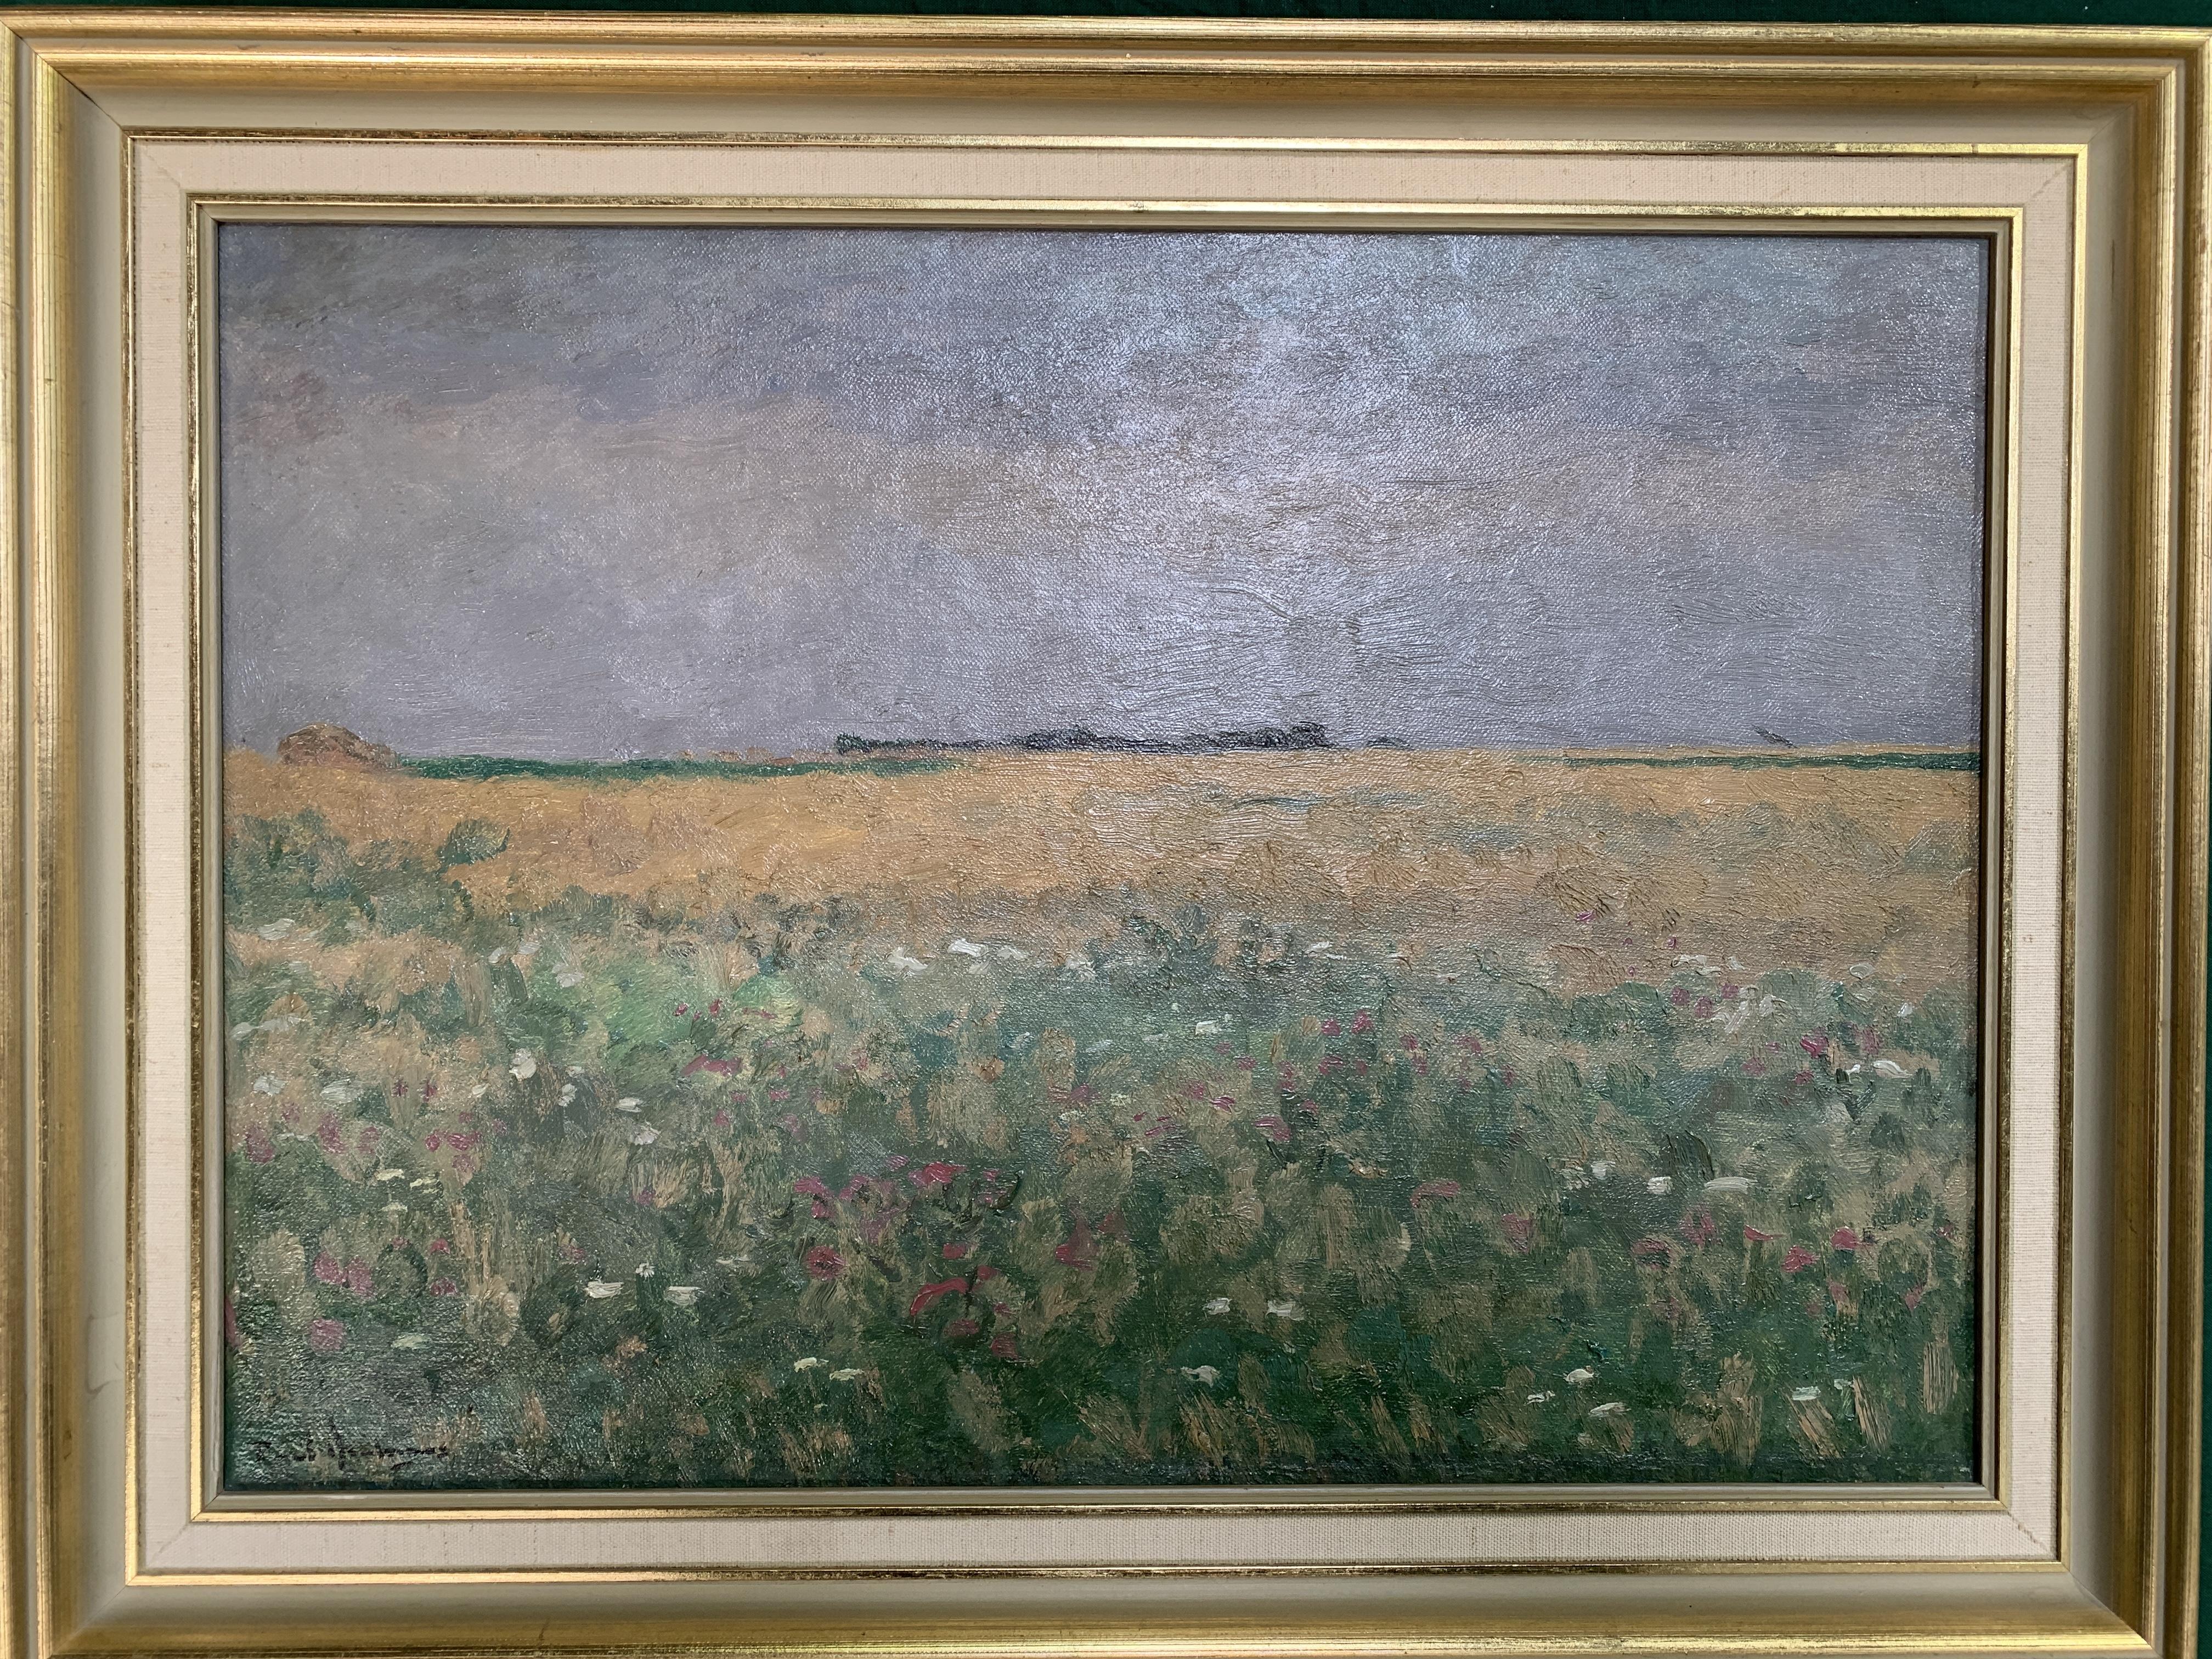 Framed oil on canvas of fields signed P. Arntzenius - Image 2 of 4